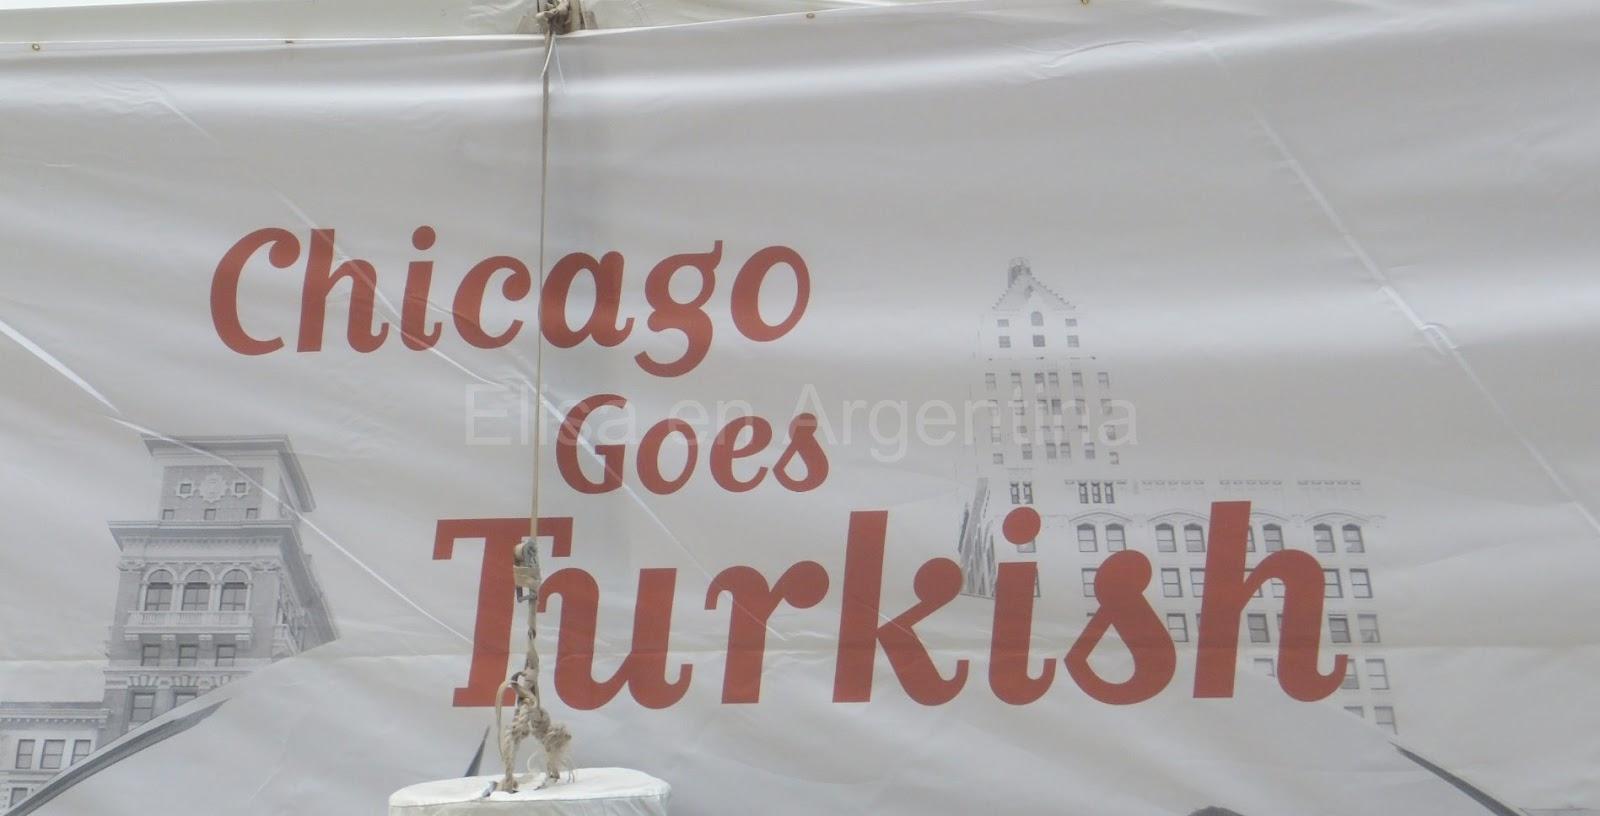 Picasso, Chicago, Elisa N, Blog de Viajes, Lifestyle, Travel